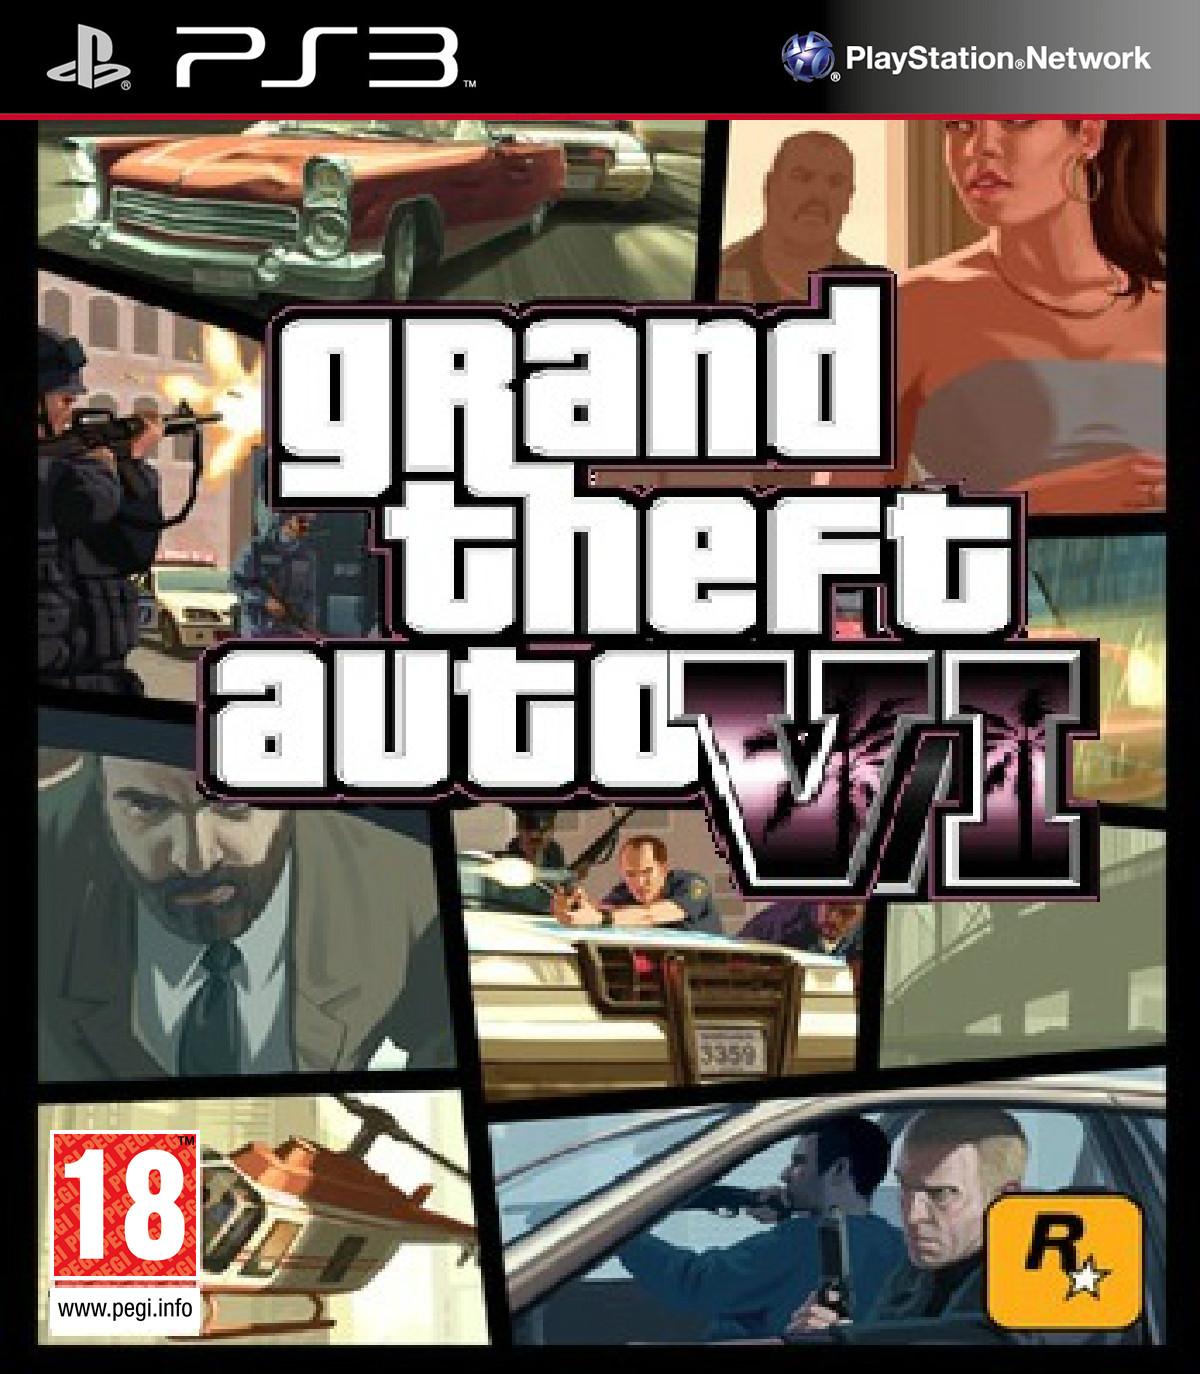 Gta Grand Theft Auto V 5 Ps3: GTA 6 Wishlist: Will It Bring New City, Realistic Gas Cars